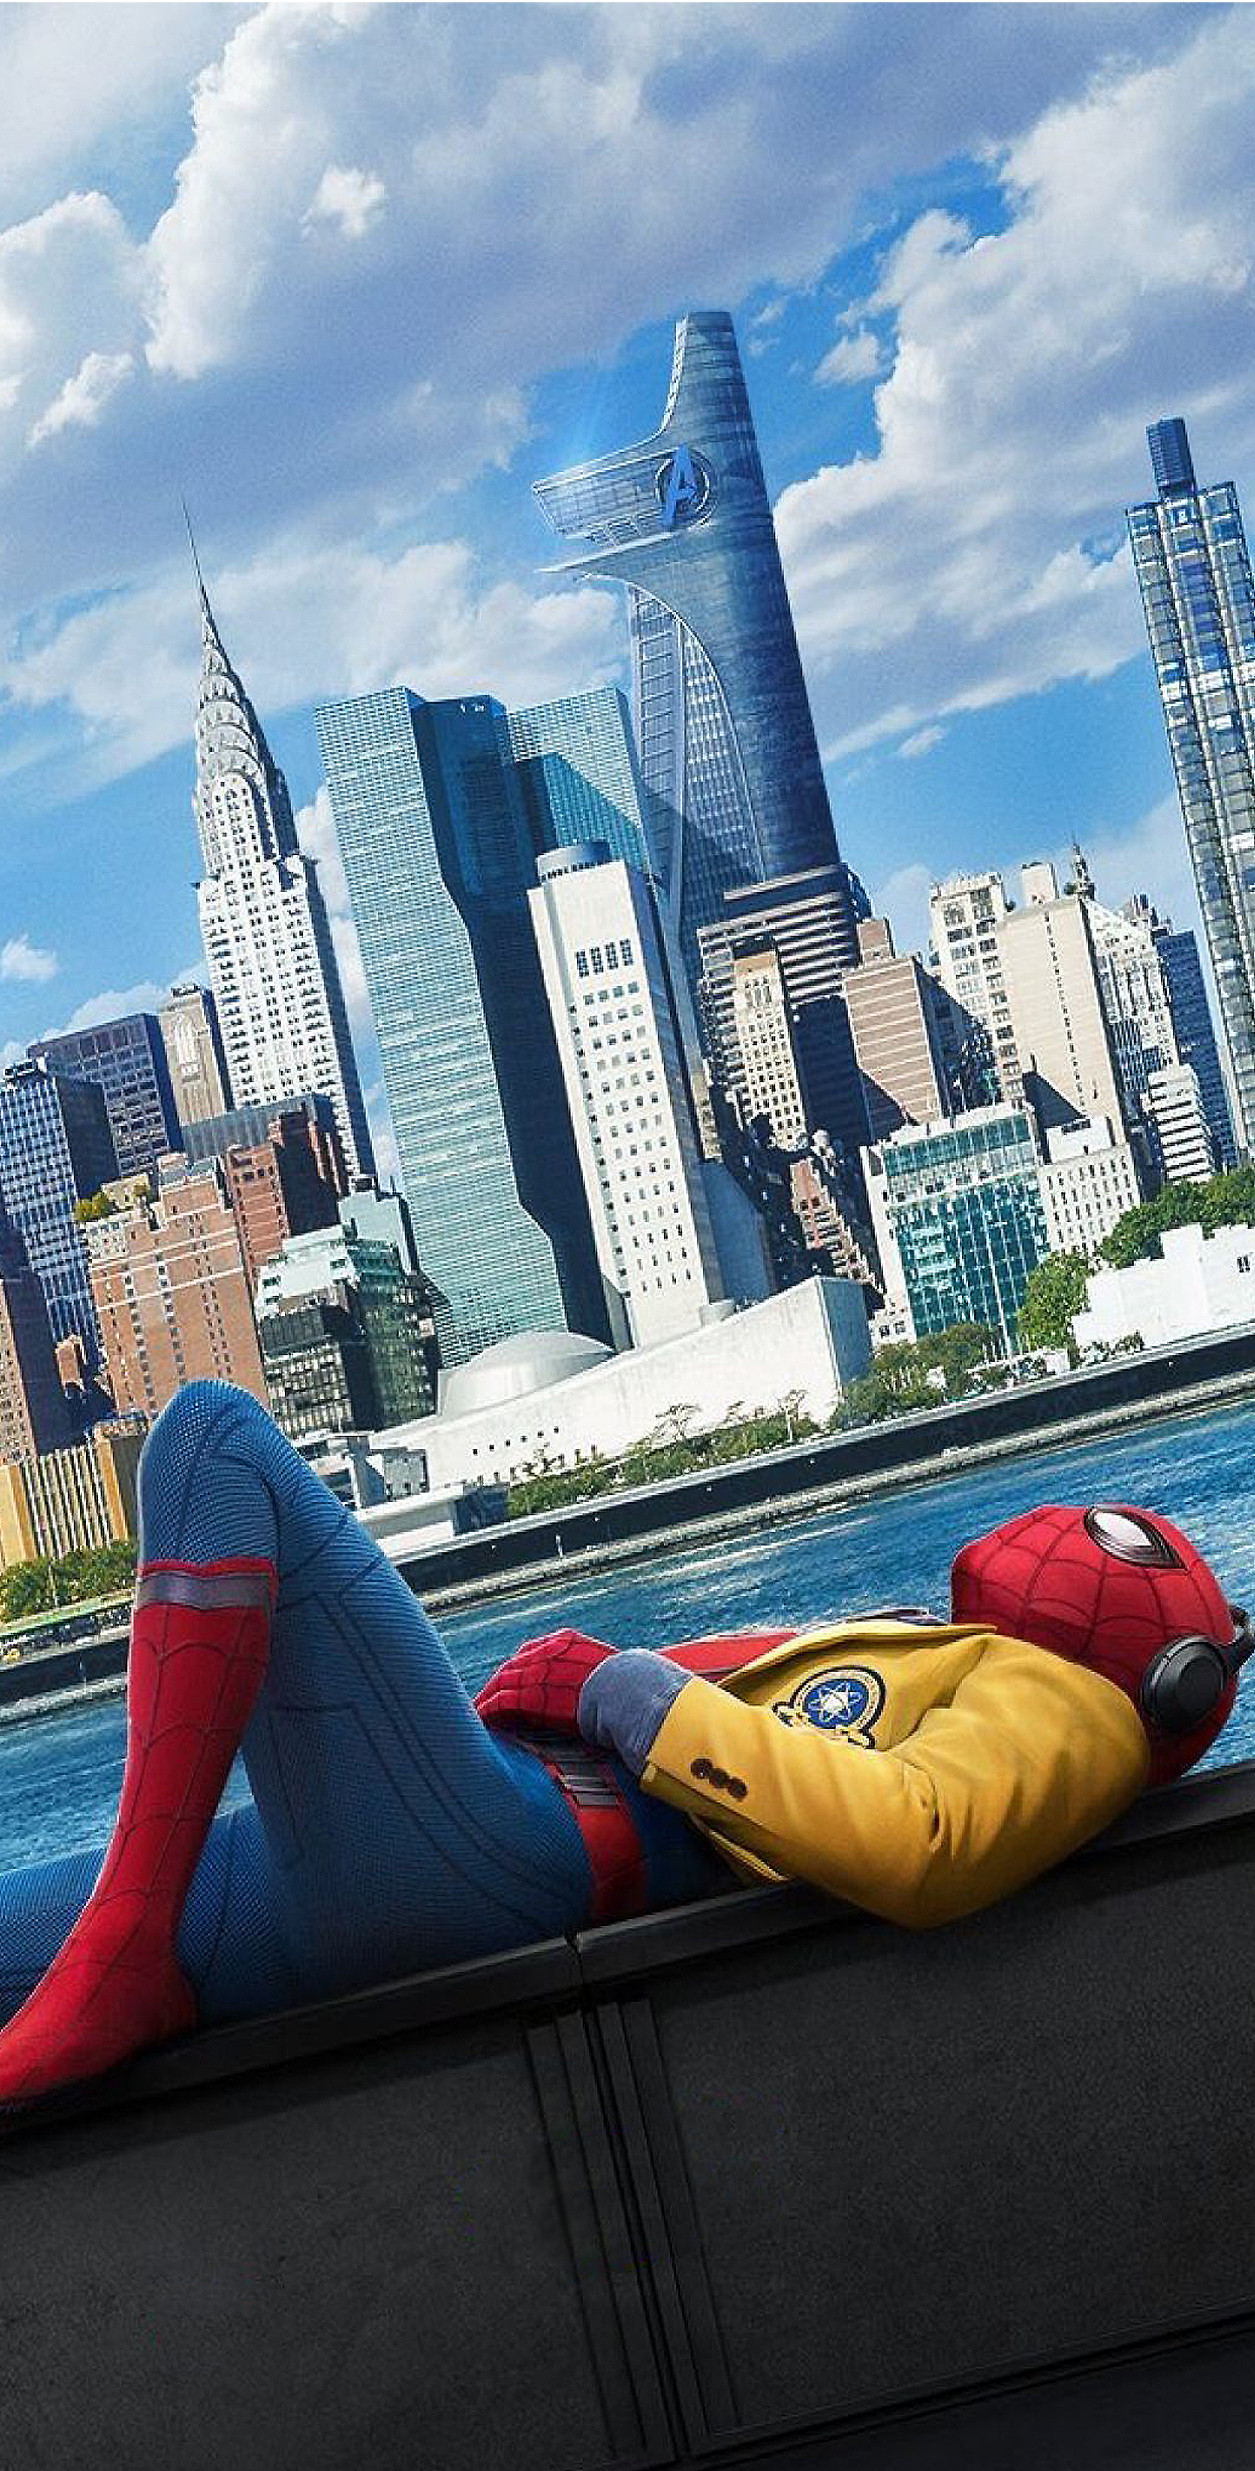 SpiderMan, marvel, comic book, superhero, Spider-Man, s8, background